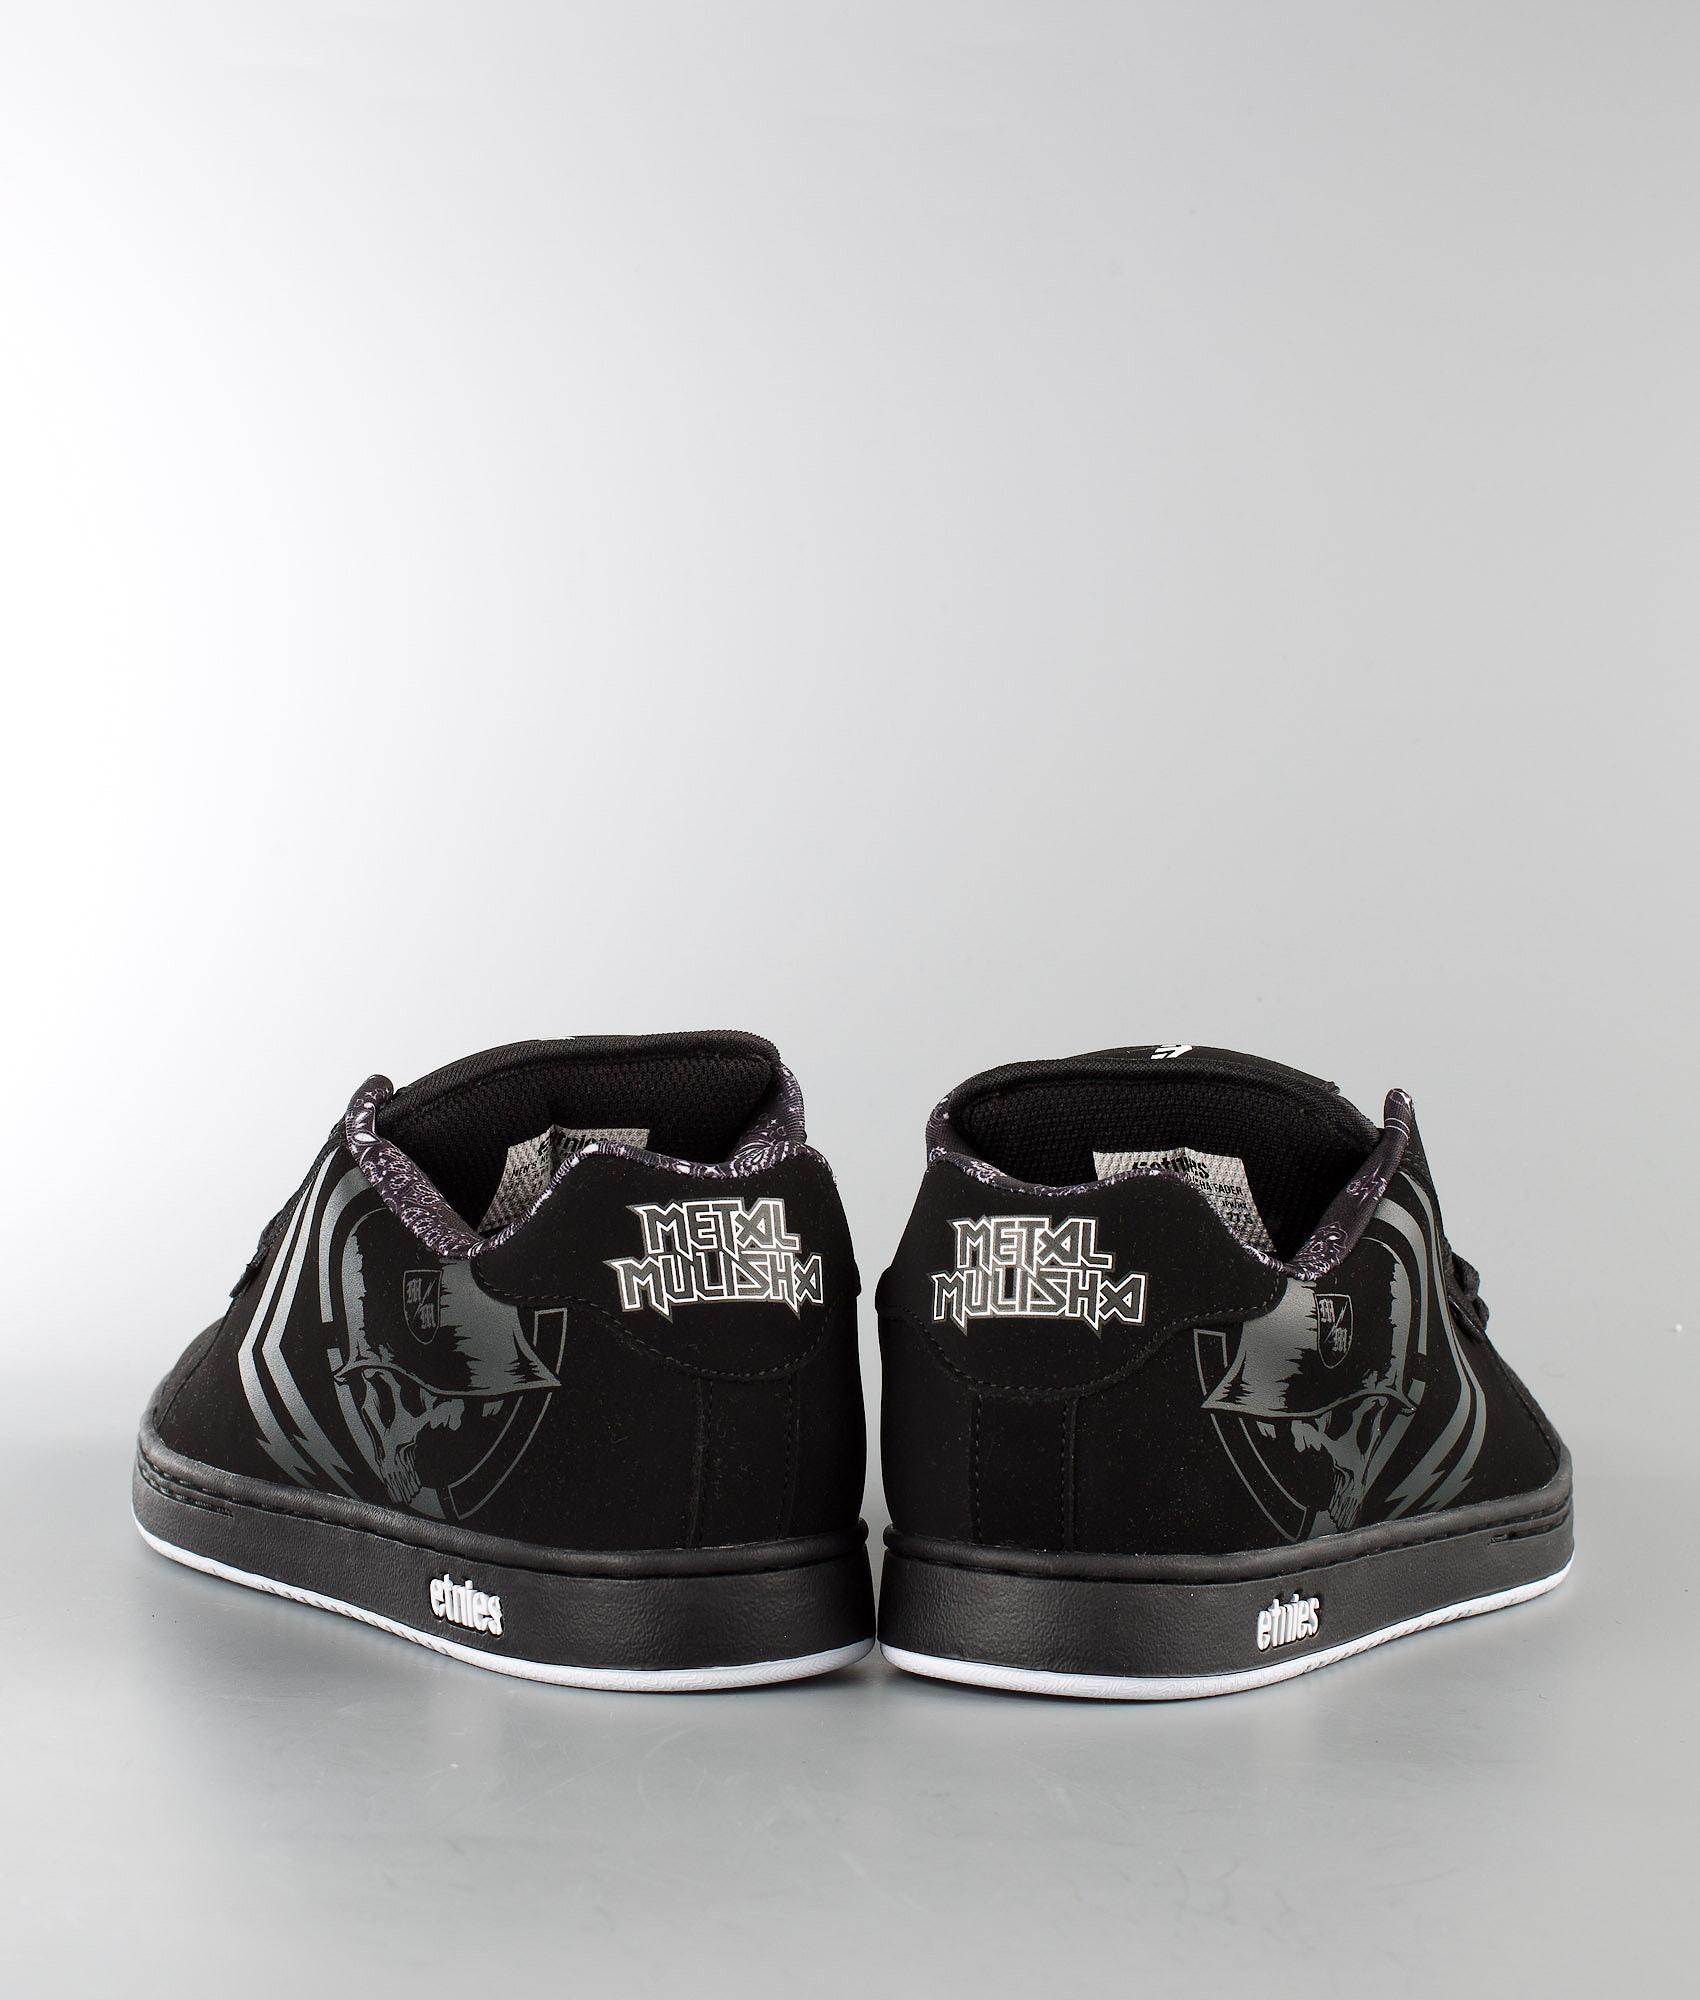 7e2067d250cb Etnies Metal Mulisha Fader Scarpe Black/White - Ridestore.it